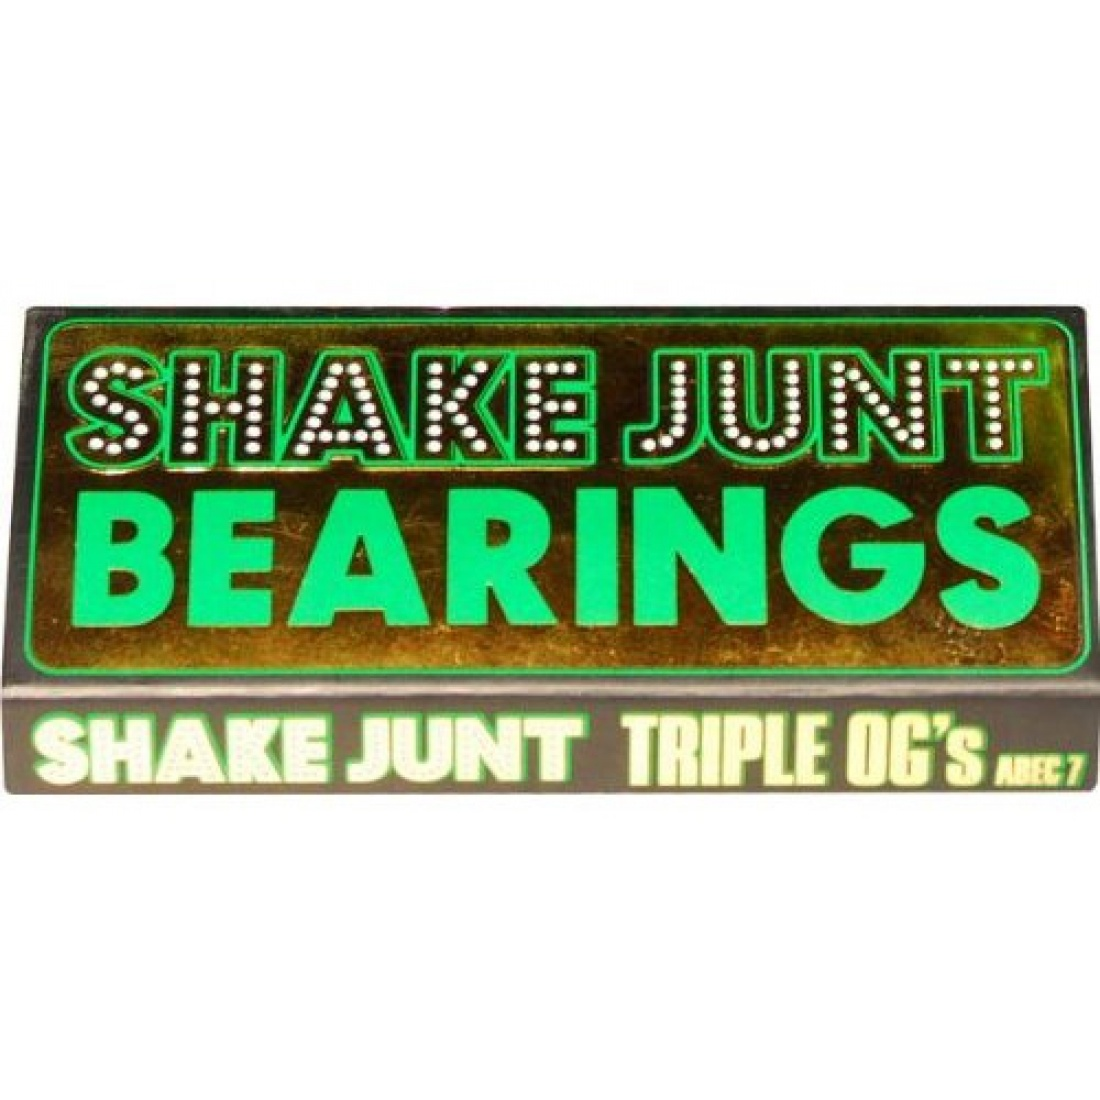 SJT-ABEC7 Bearings